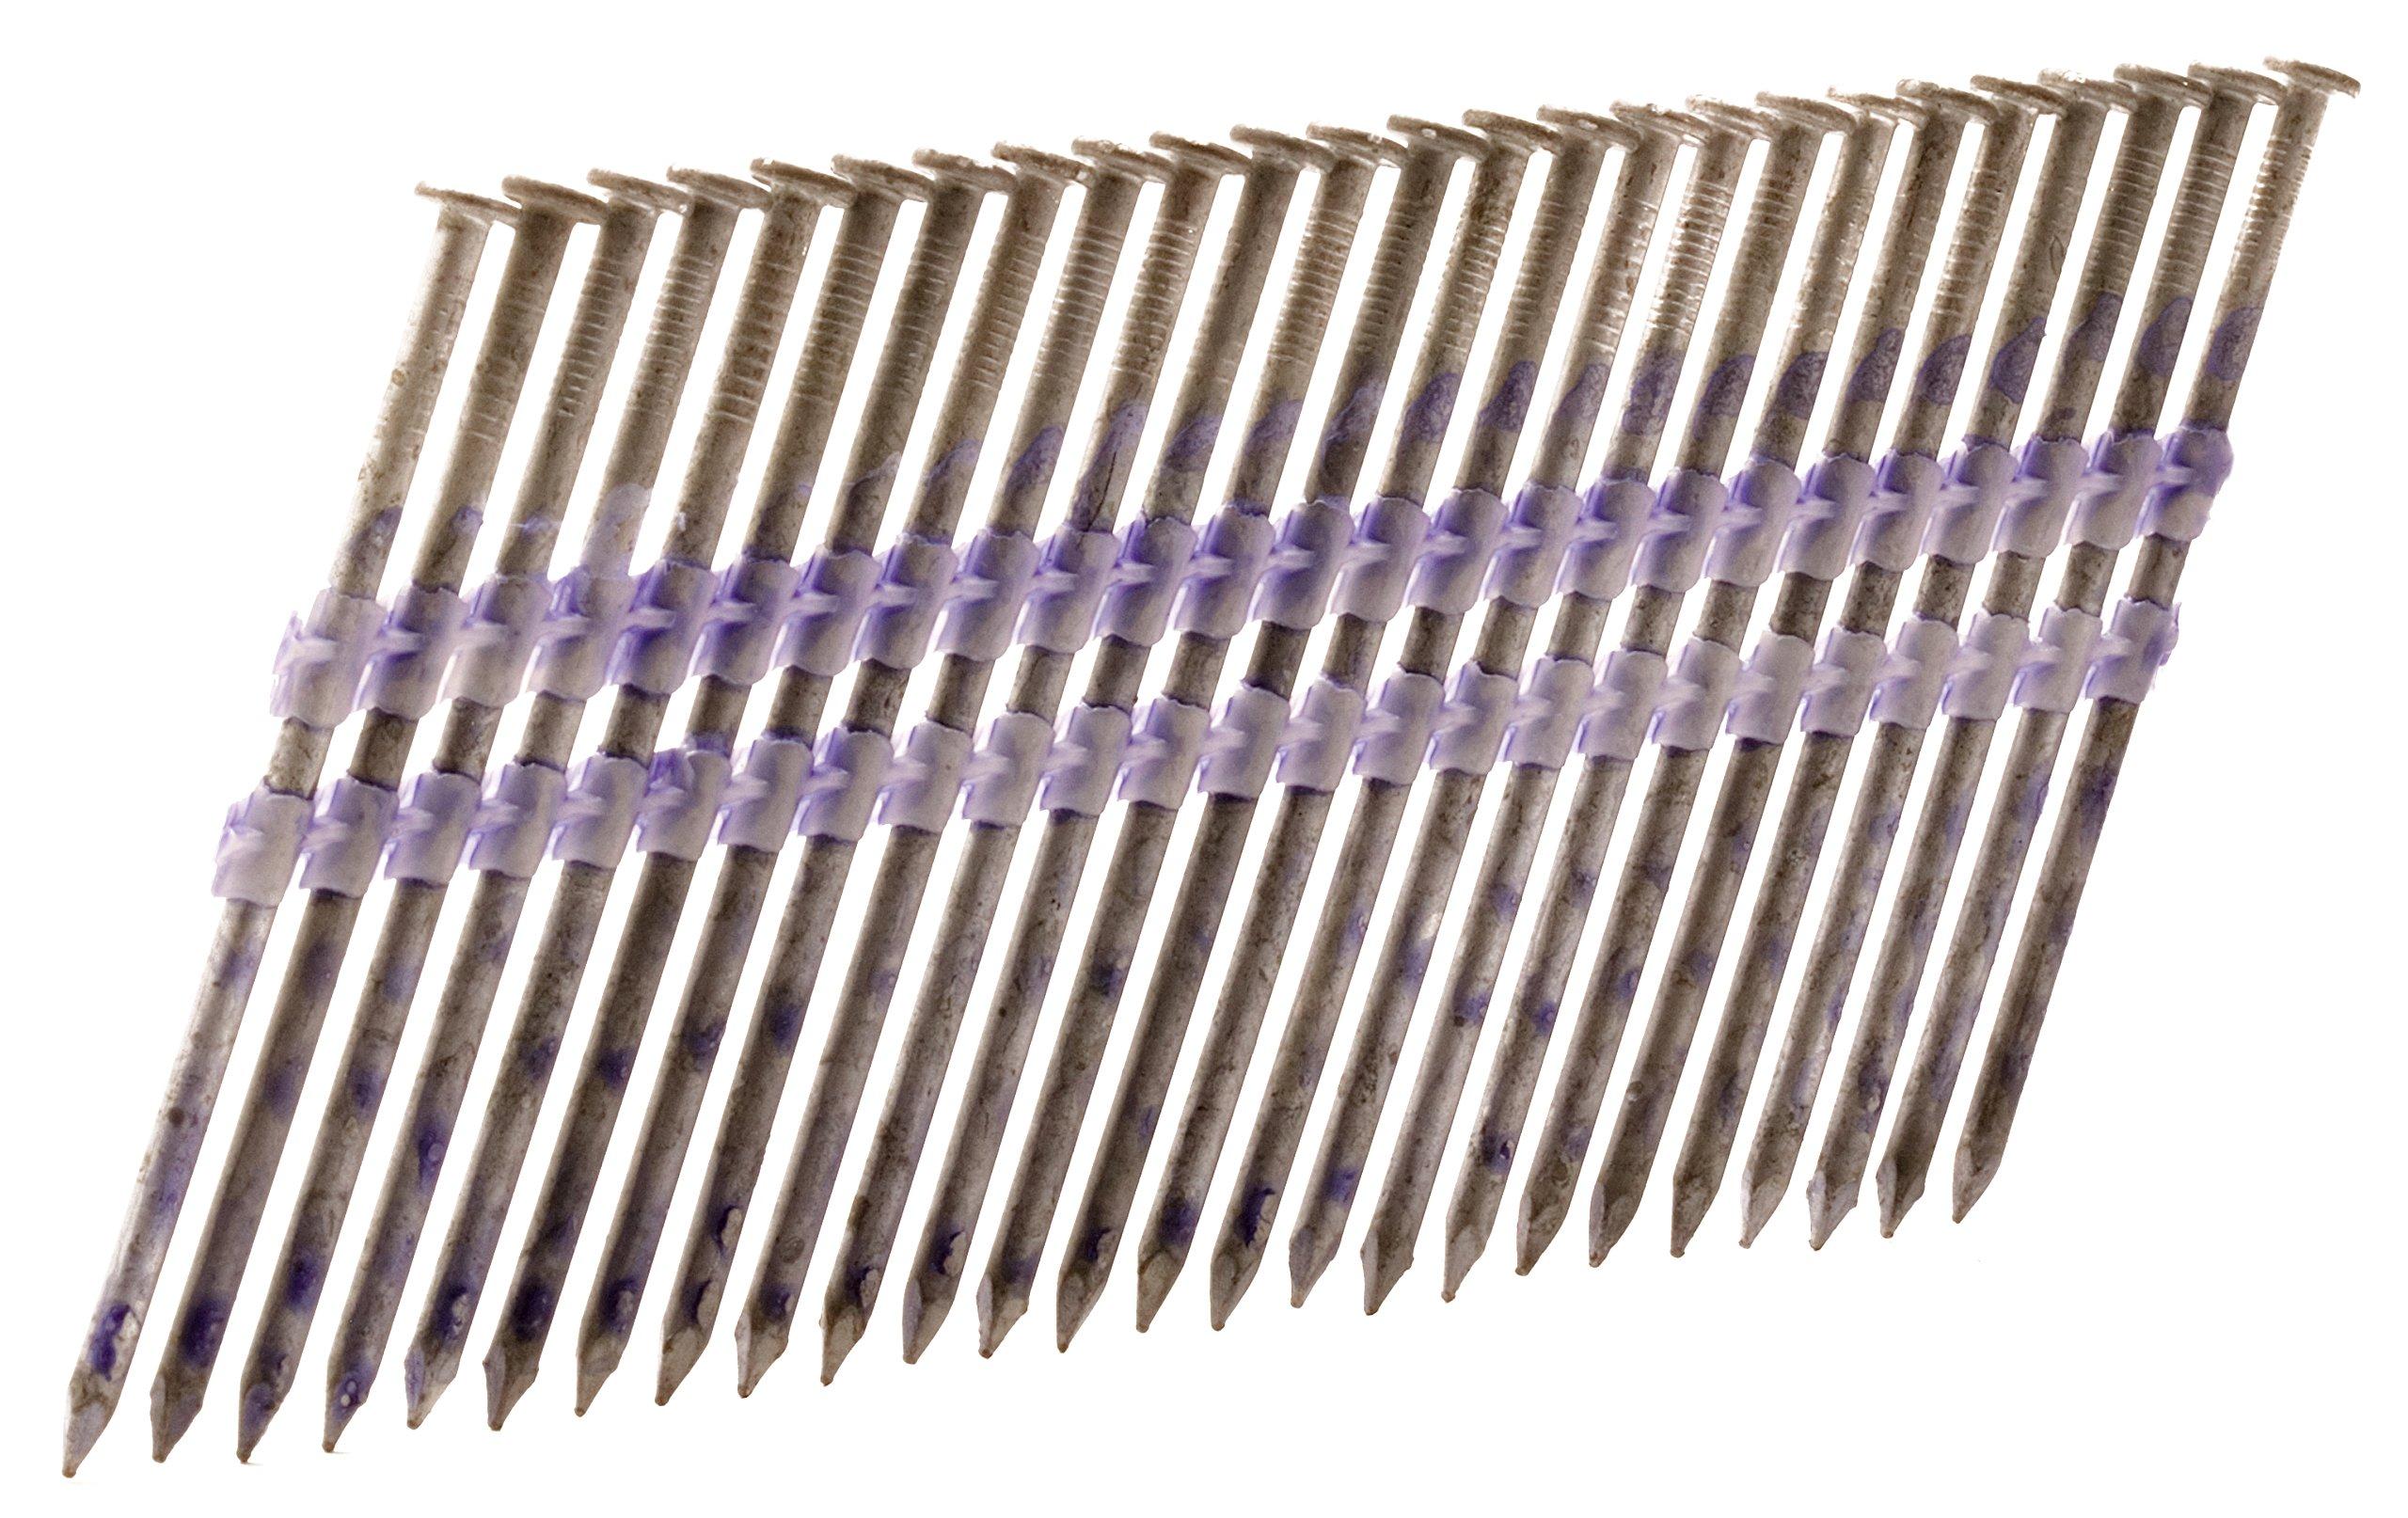 Hitachi 10167 3'' x .148 SM Full Round Head Hot Dipped Galvanized Plastic Strip Framing Nails 4, 000Count